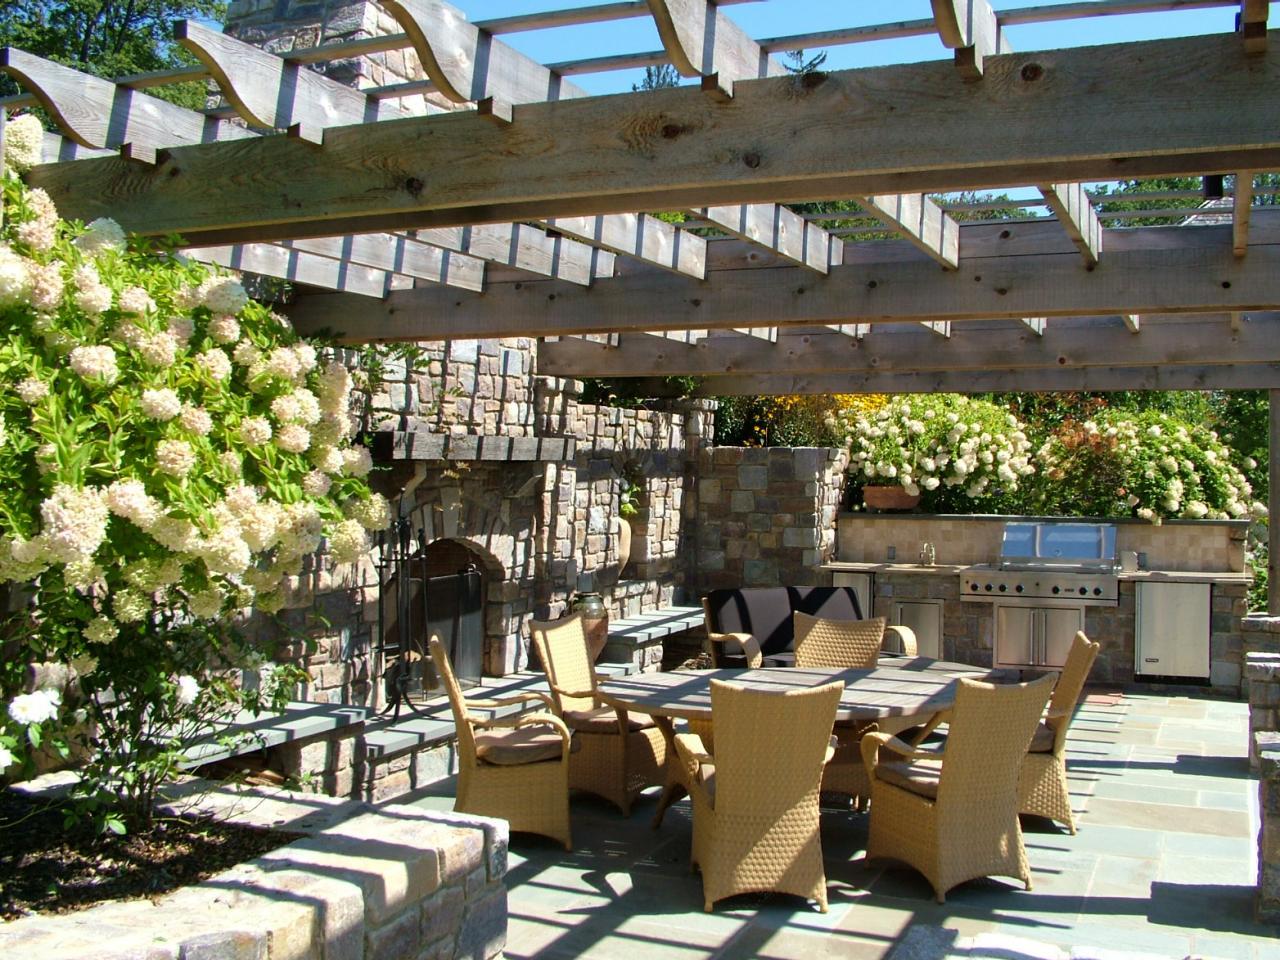 Build an outdoor kitchen - Cheap Outdoor Kitchen Ideas Building